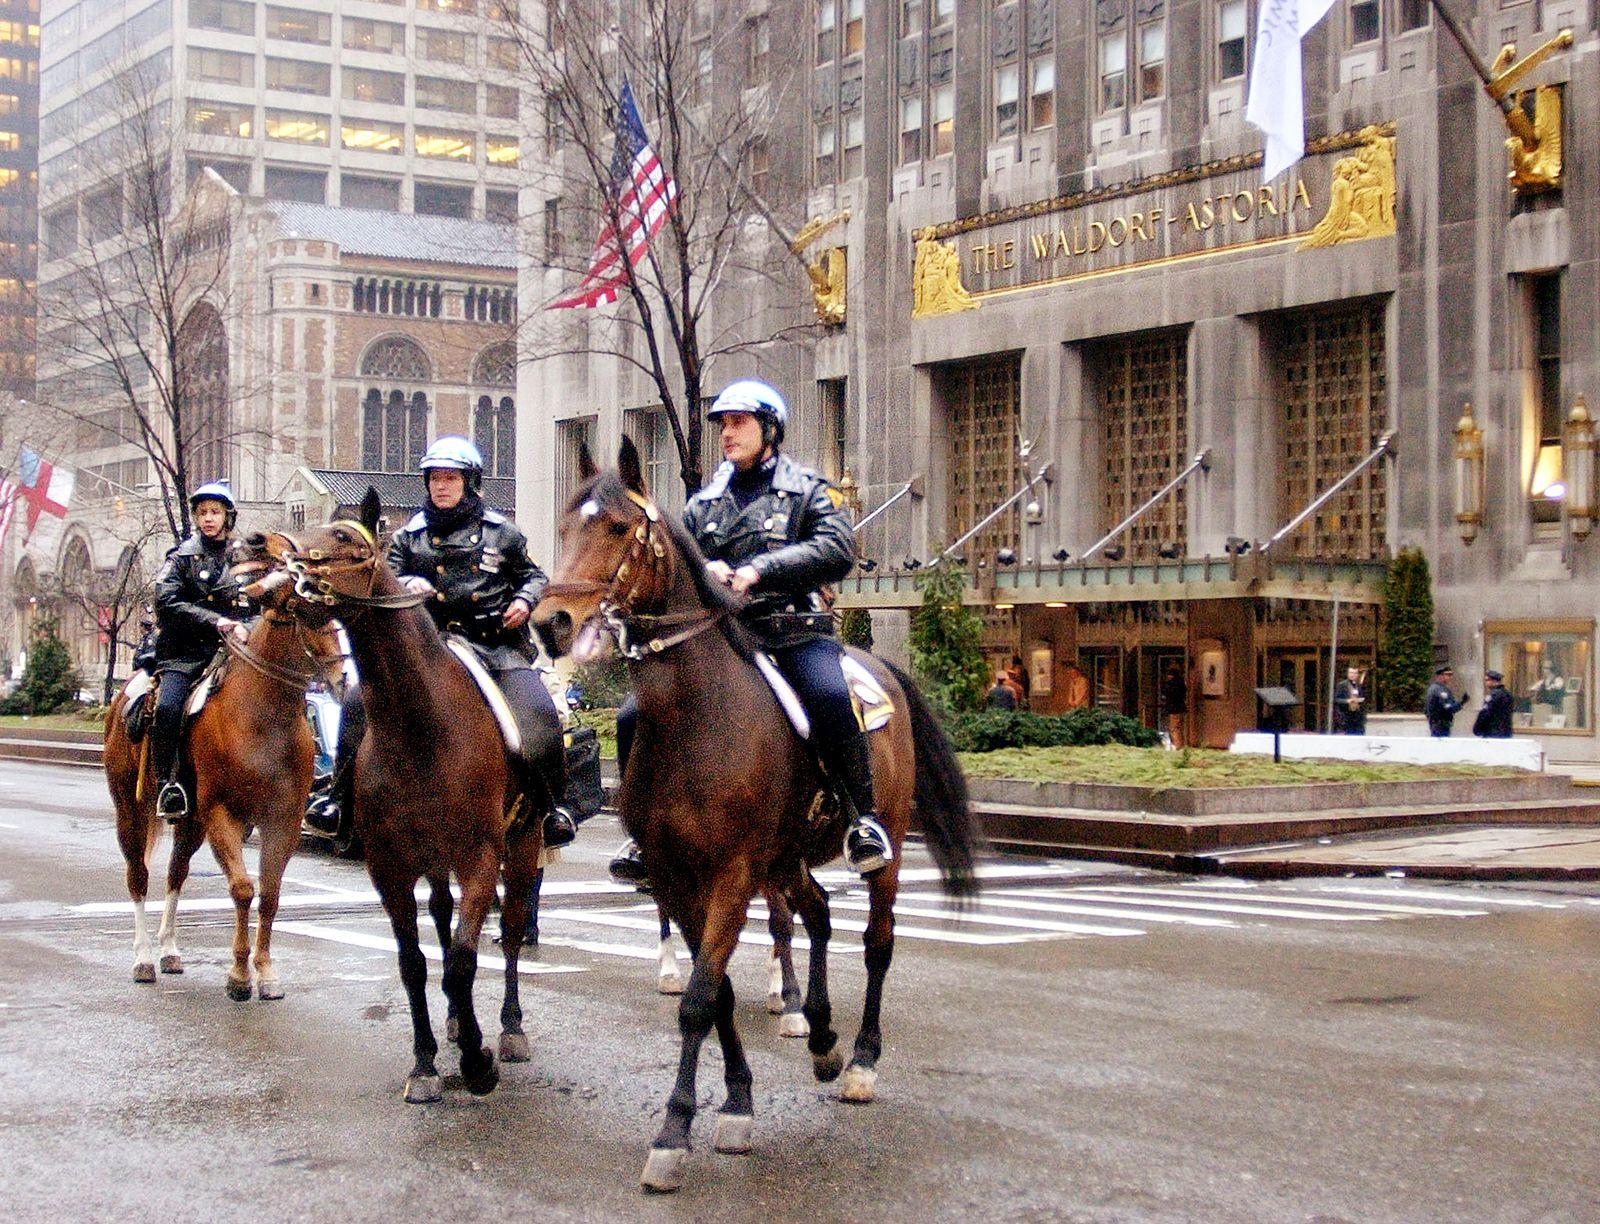 Waldorf Astoria Hotel / New York